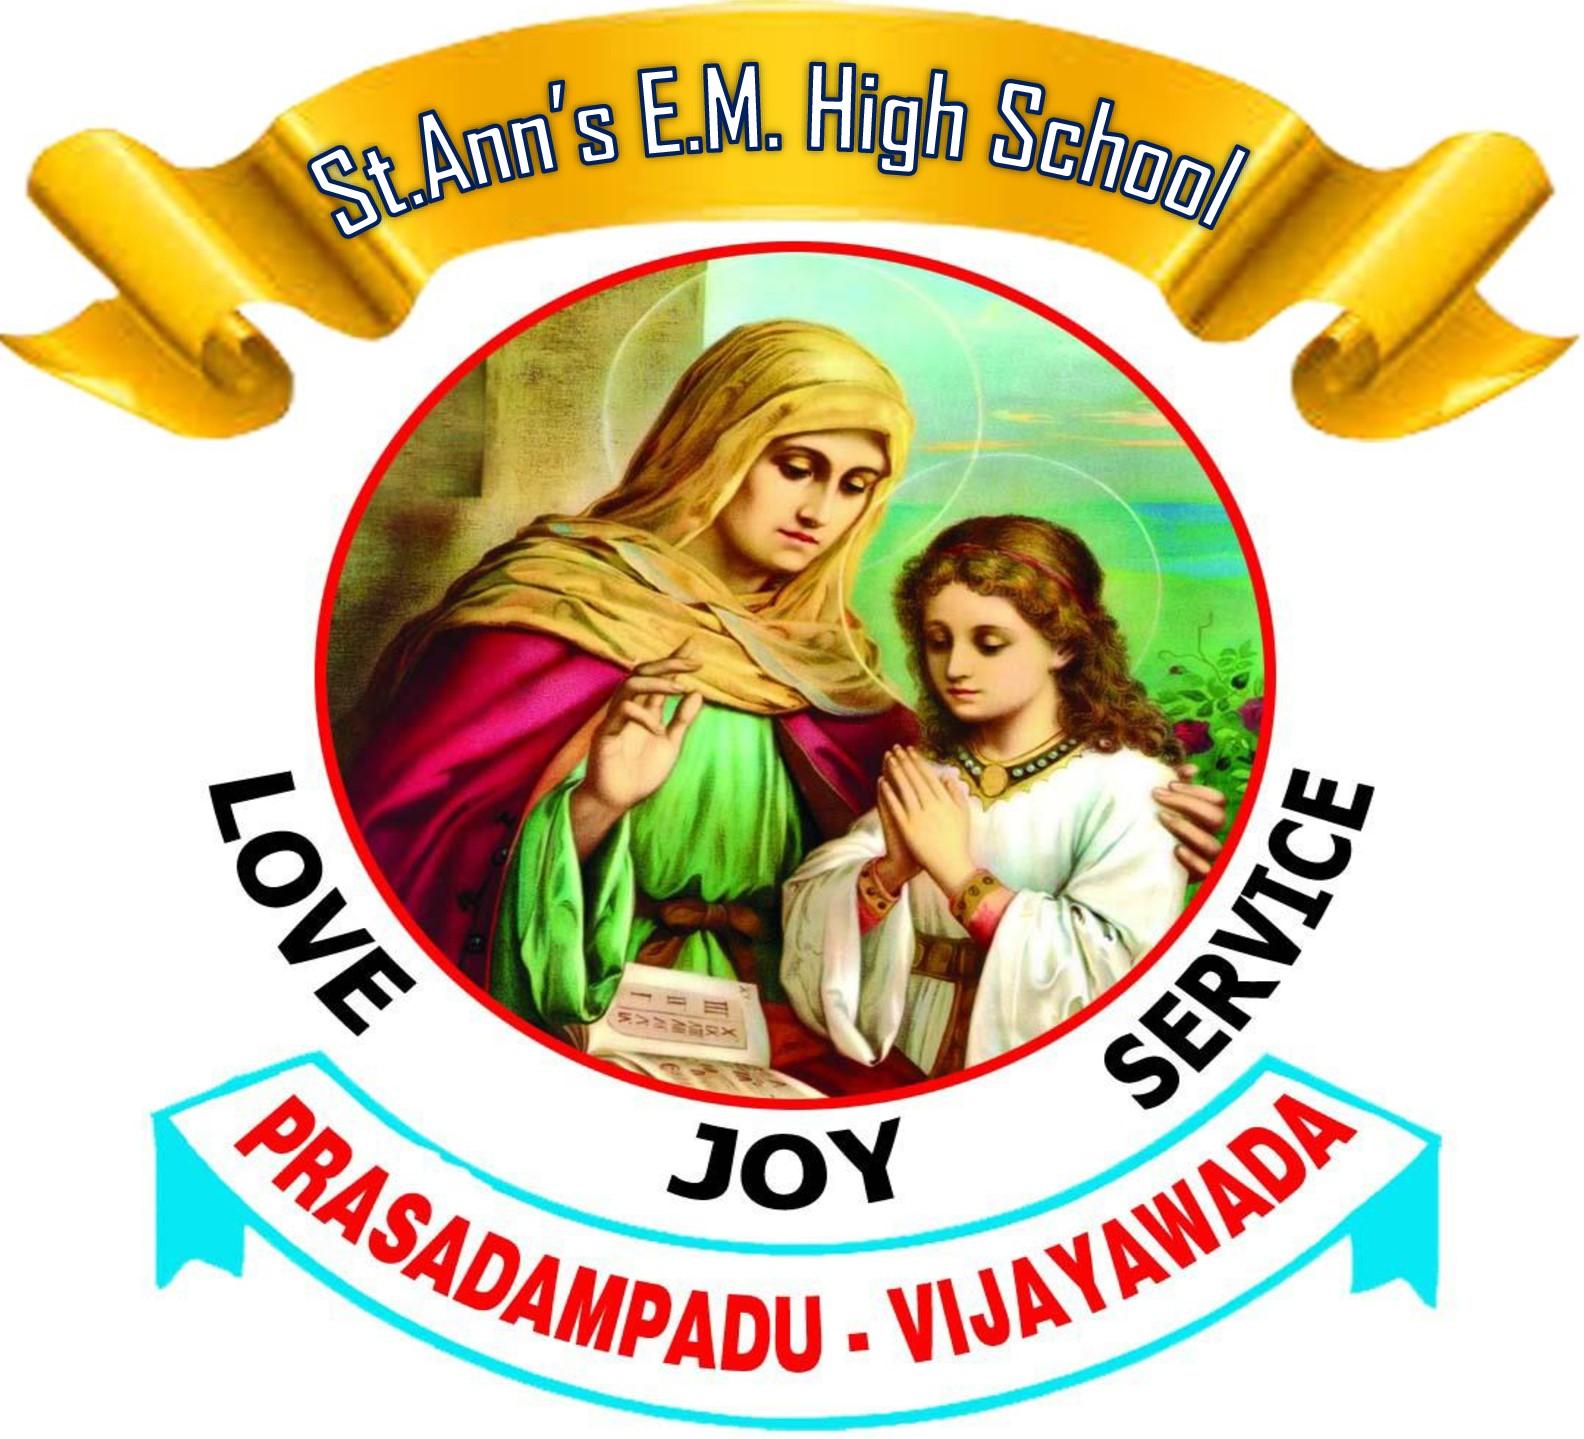 St Ann's CBSE School,Prasadampadu